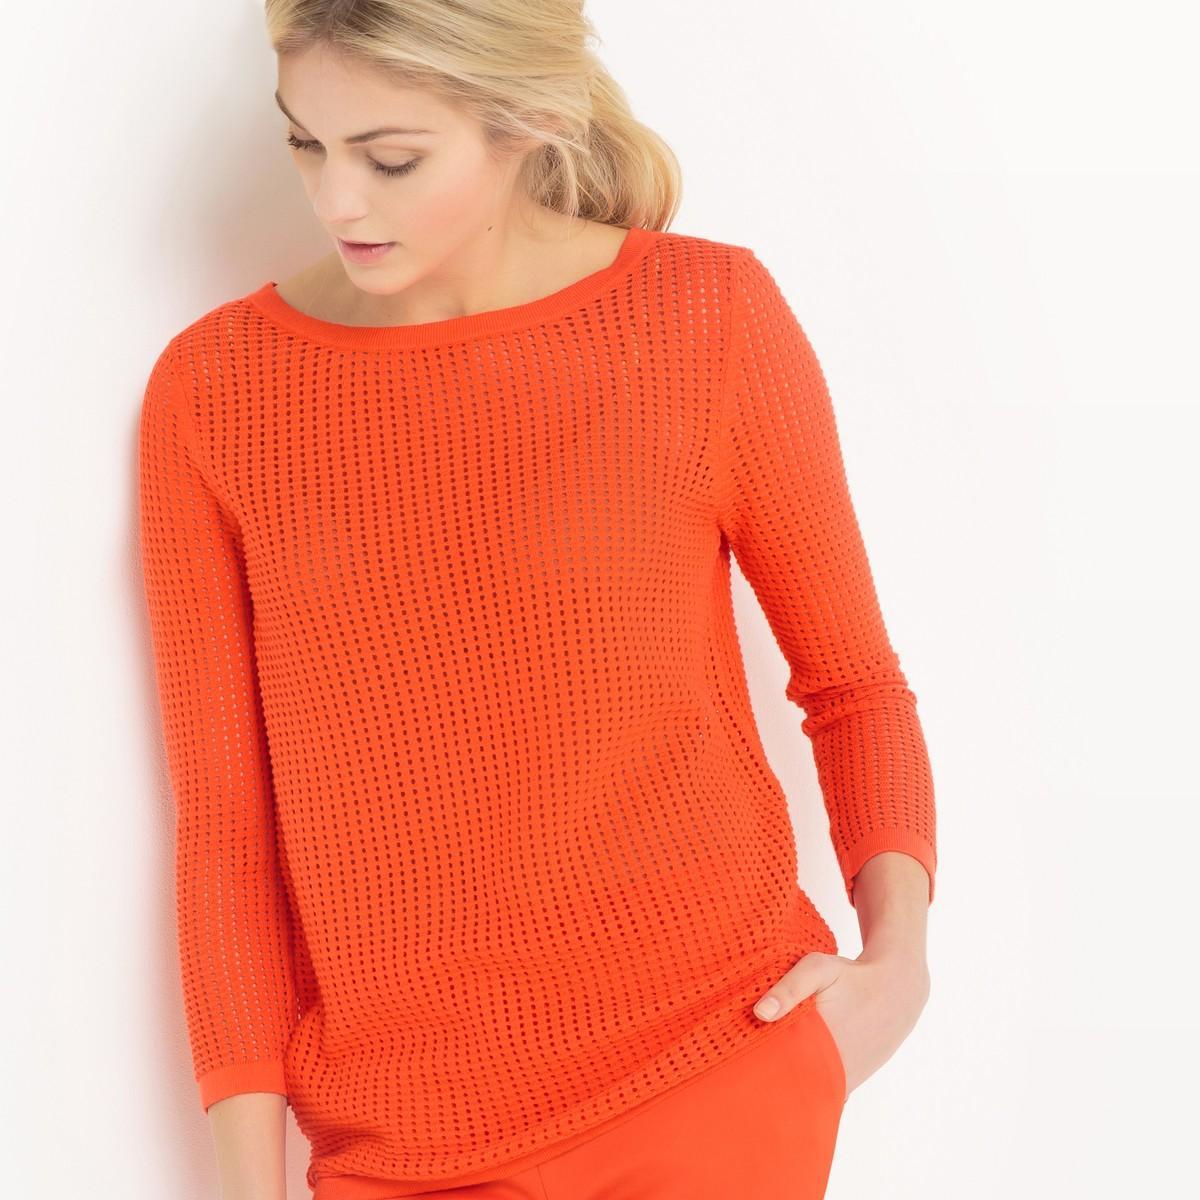 la redoute pull ajour col bateau in orange lyst. Black Bedroom Furniture Sets. Home Design Ideas